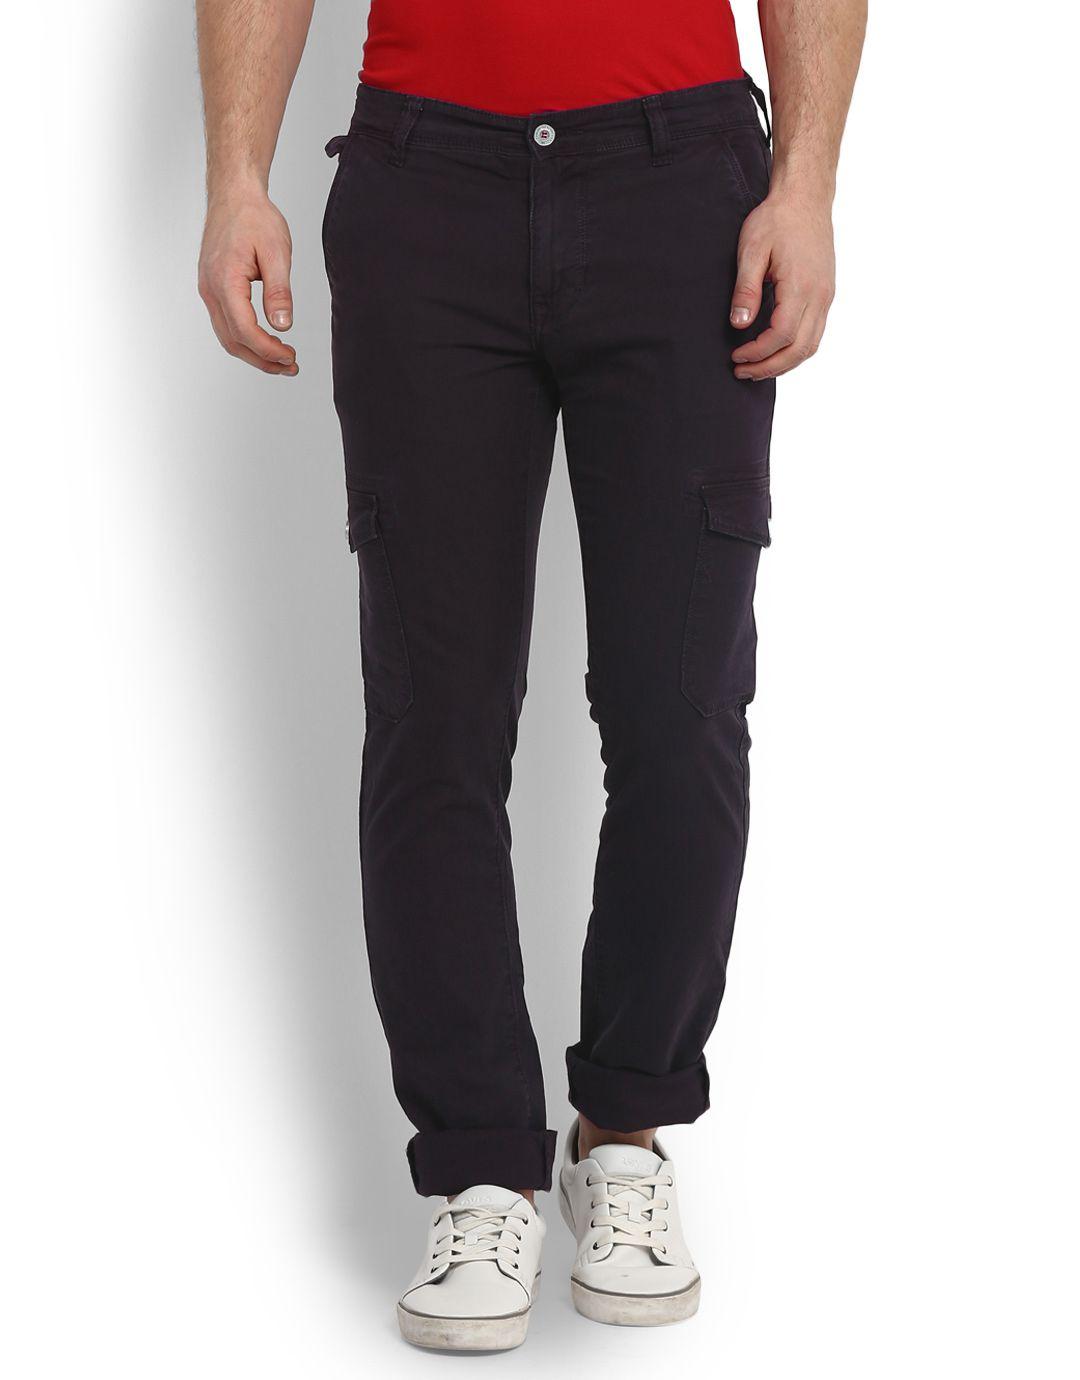 LAWMAN pg3 Grey Fit Flat Trousers